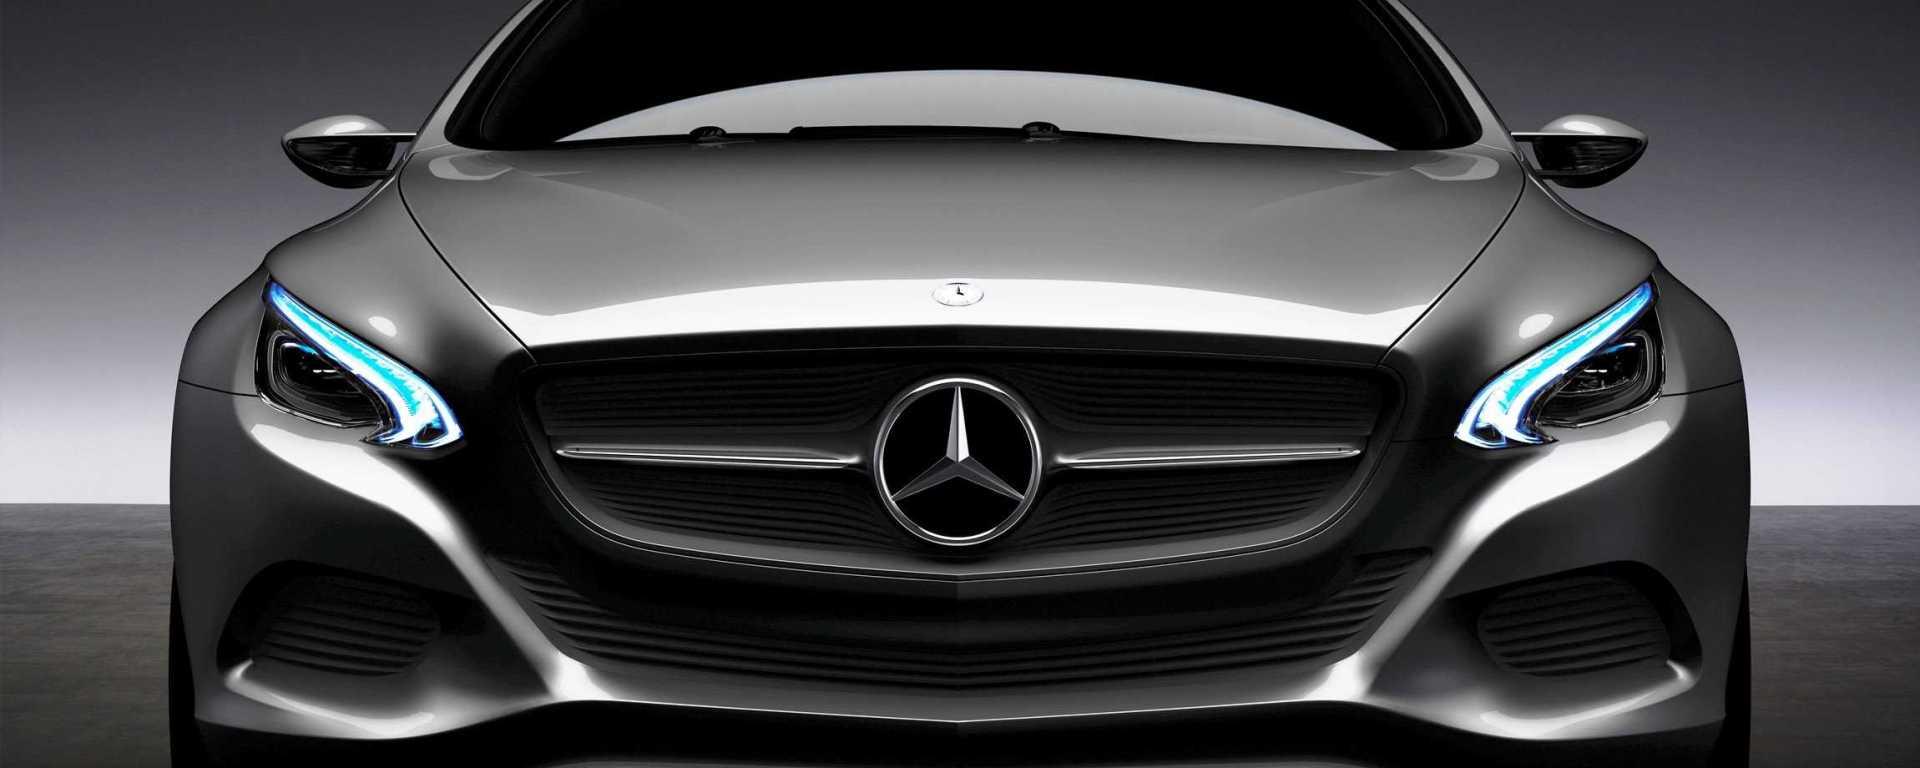 MercedesBenz India Inaugurates The Advanced Auto Body Repair - Mercedes benz body repair centre